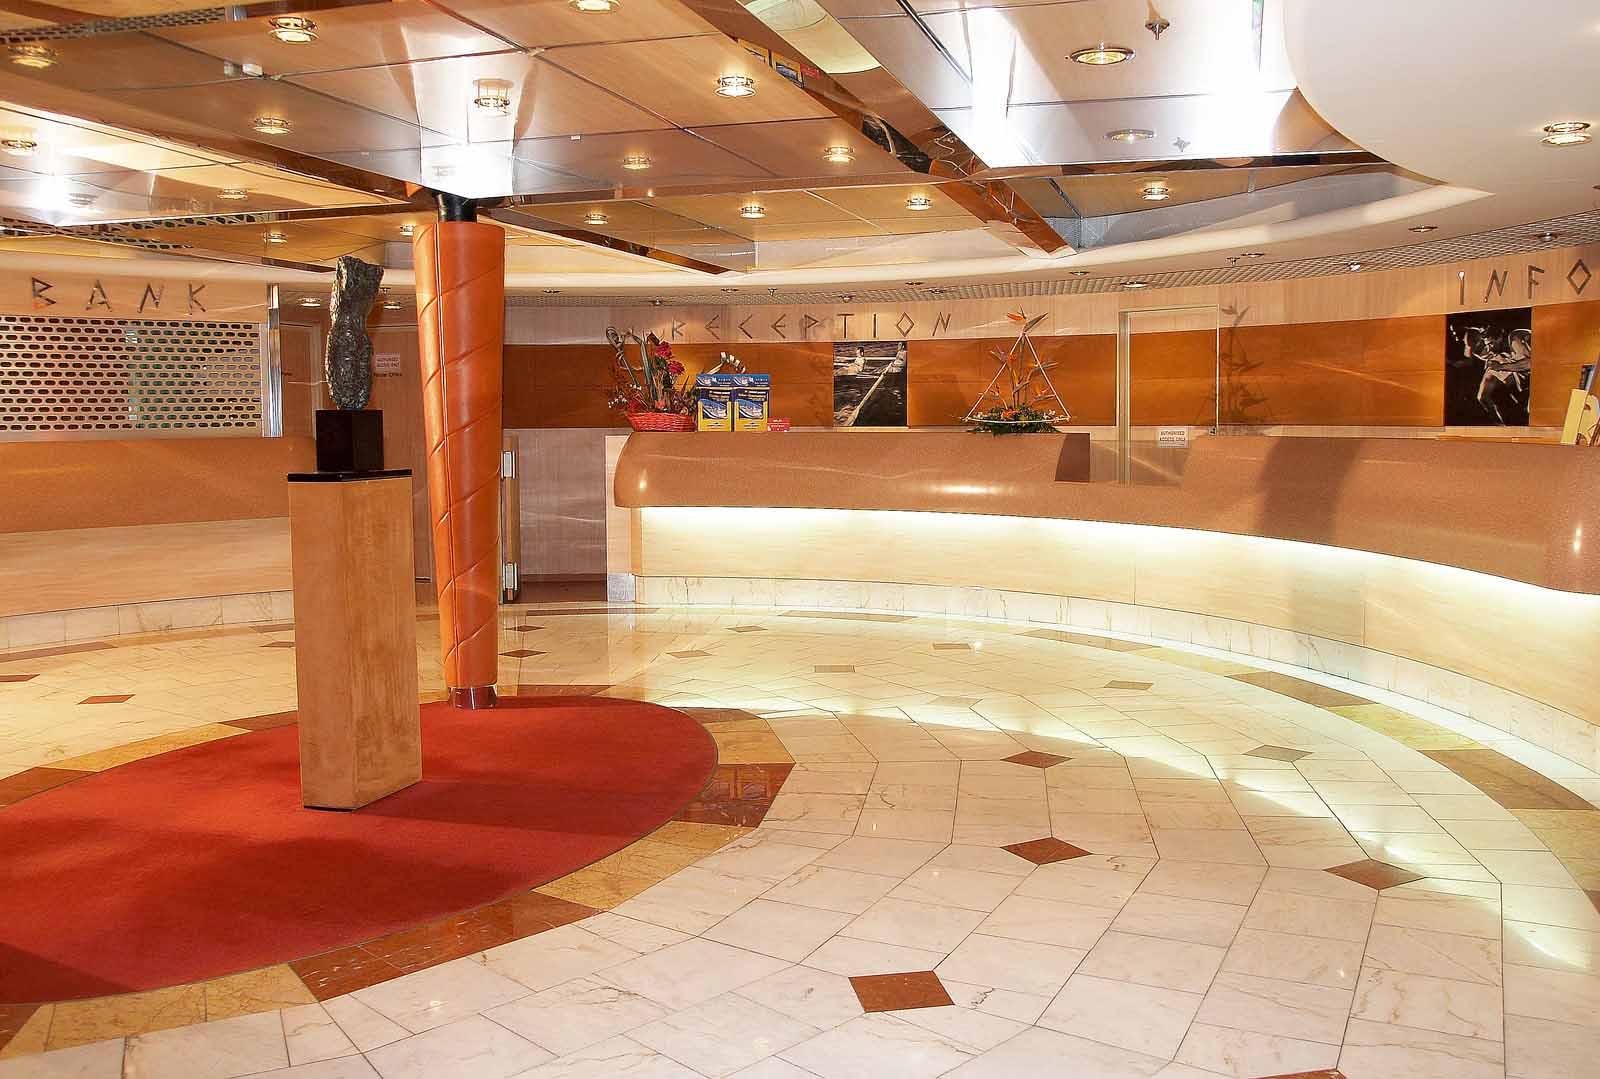 H/S/F Hellenic Spirit Reception - Bank